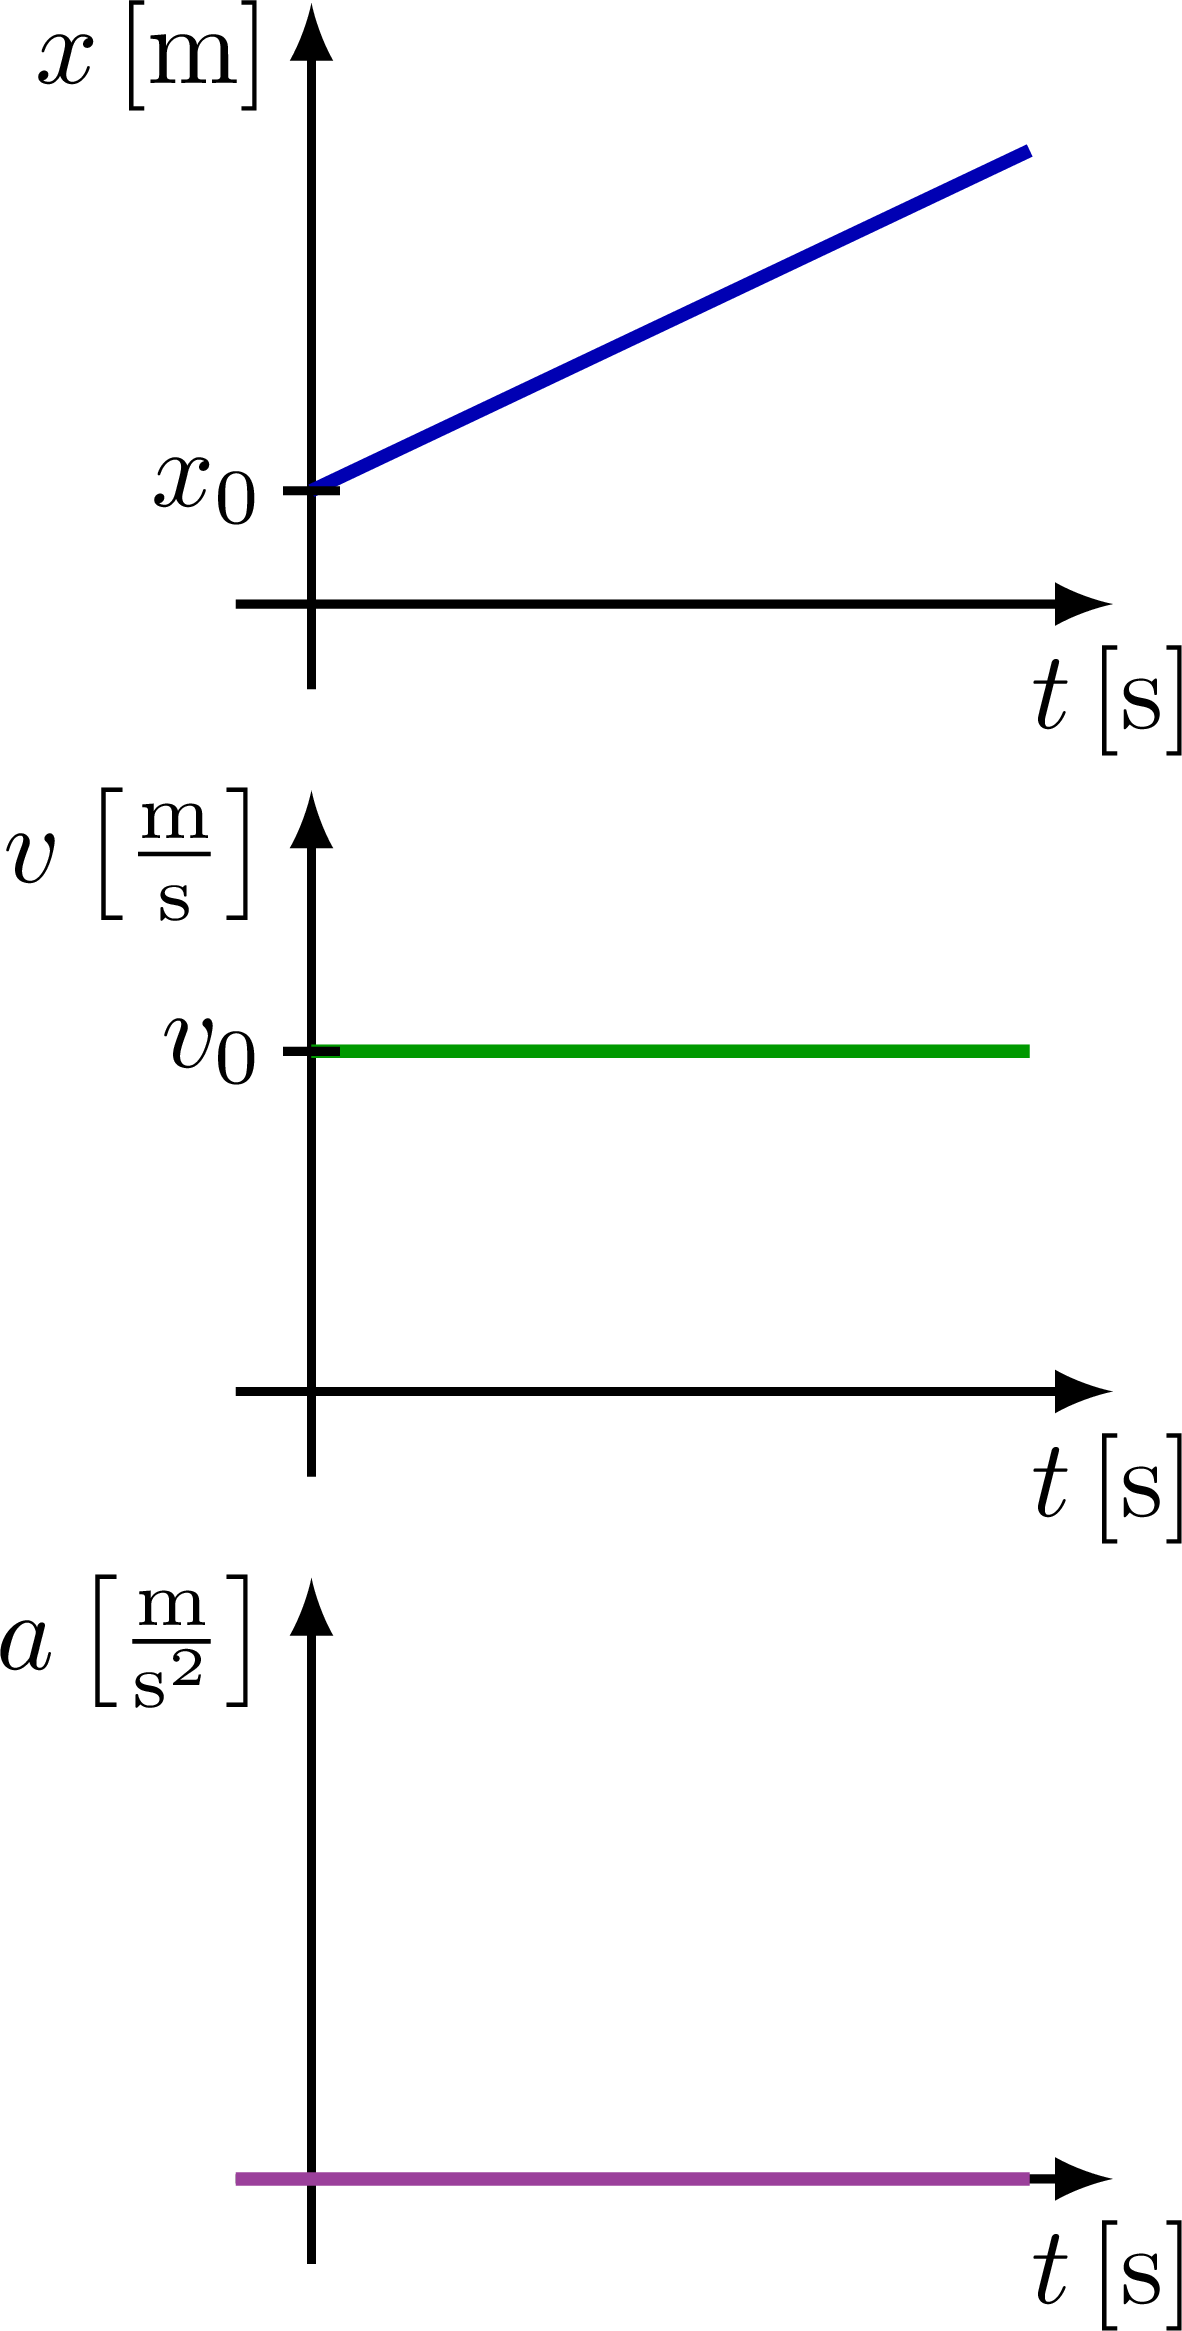 kinematics_curves_xva-002.png